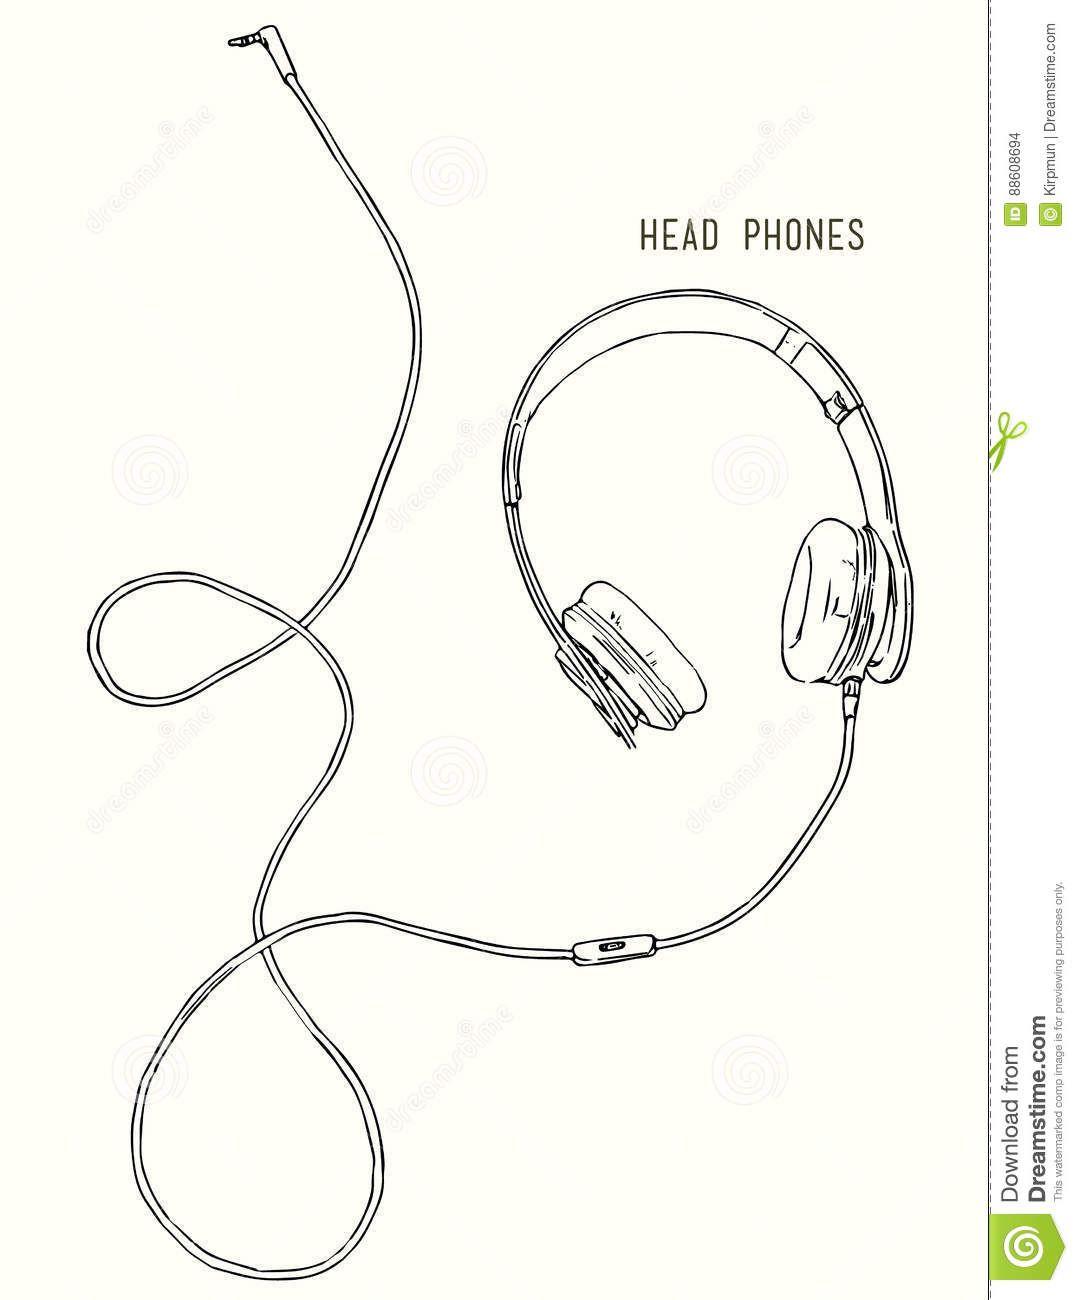 Sketch Style Vector Headphones Stock Vector Illustration Of Cable Hear 88608694 Headphones Art Headphones Drawing Headphone Sketch